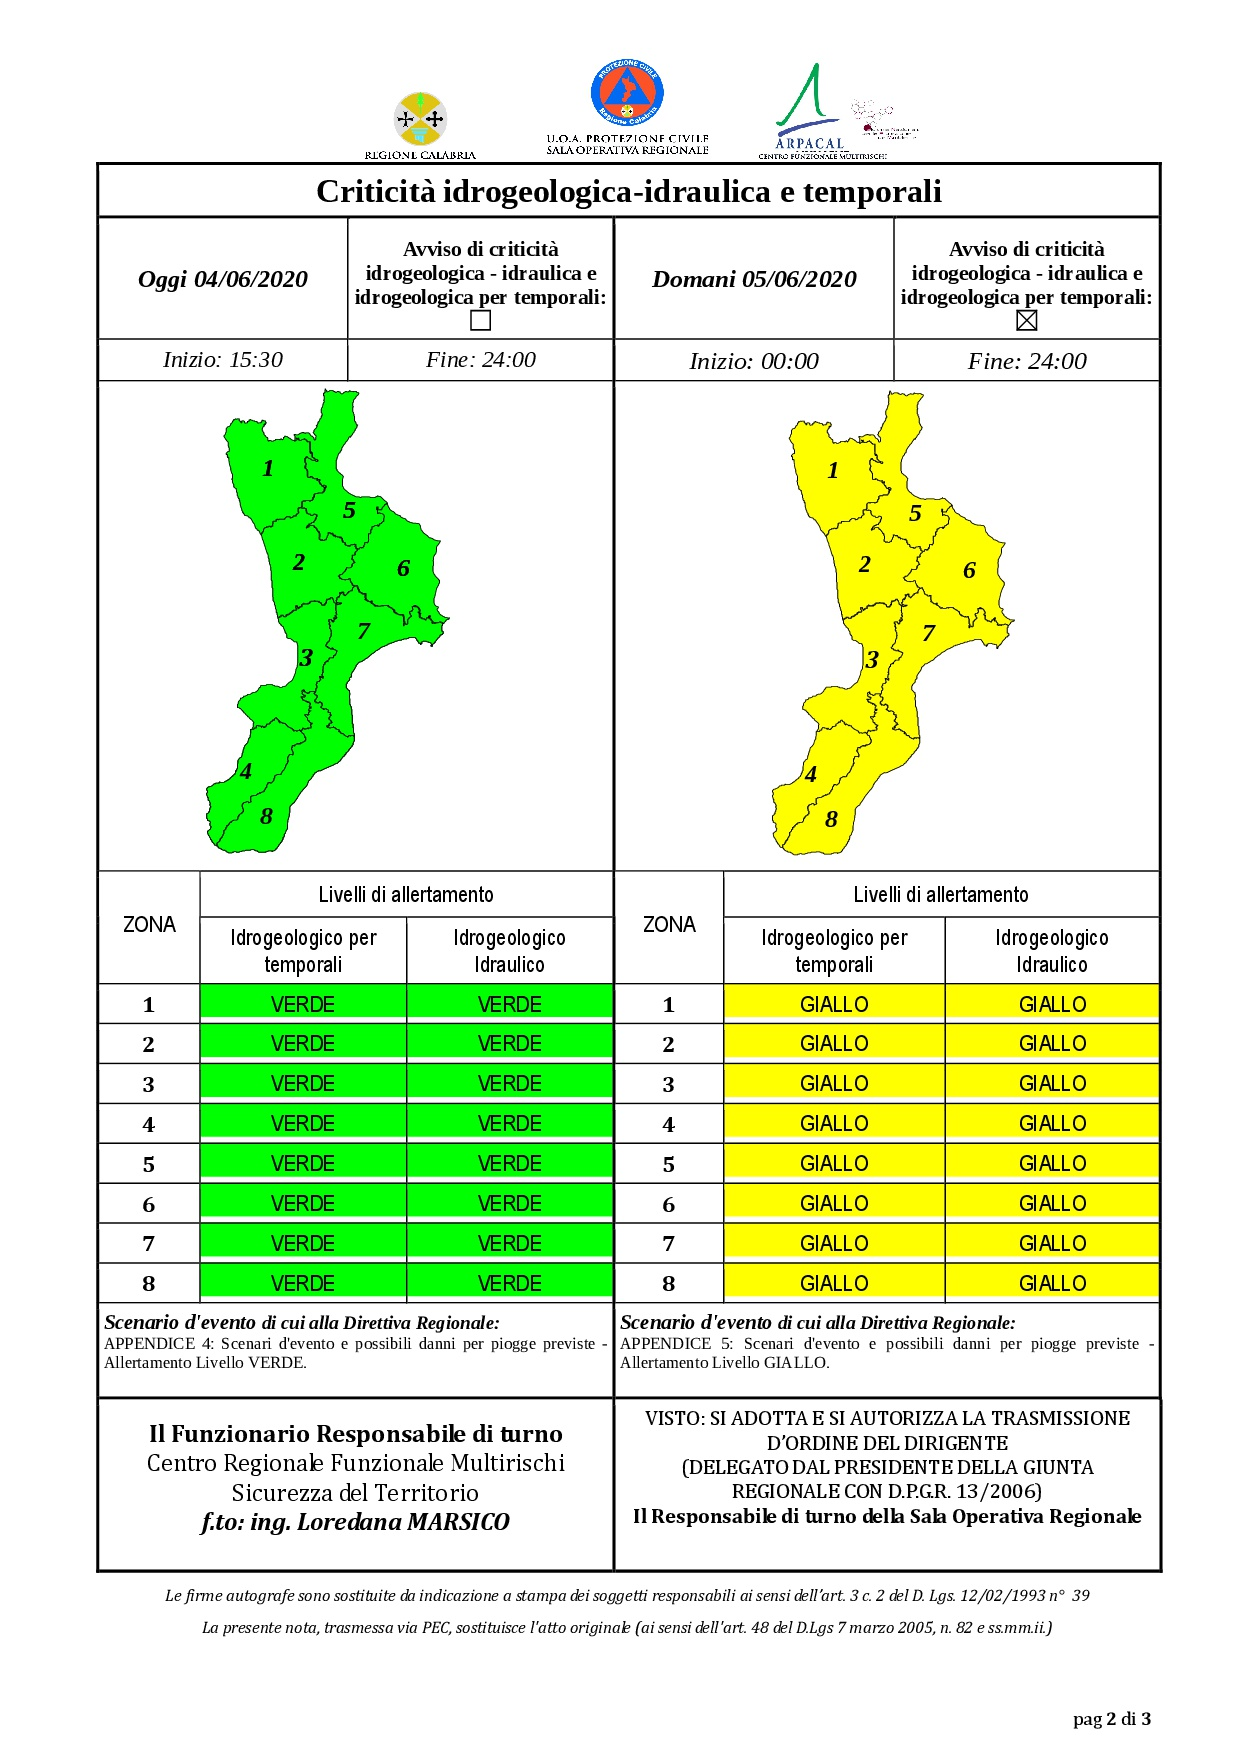 Criticità idrogeologica-idraulica e temporali in Calabria 04-06-2020